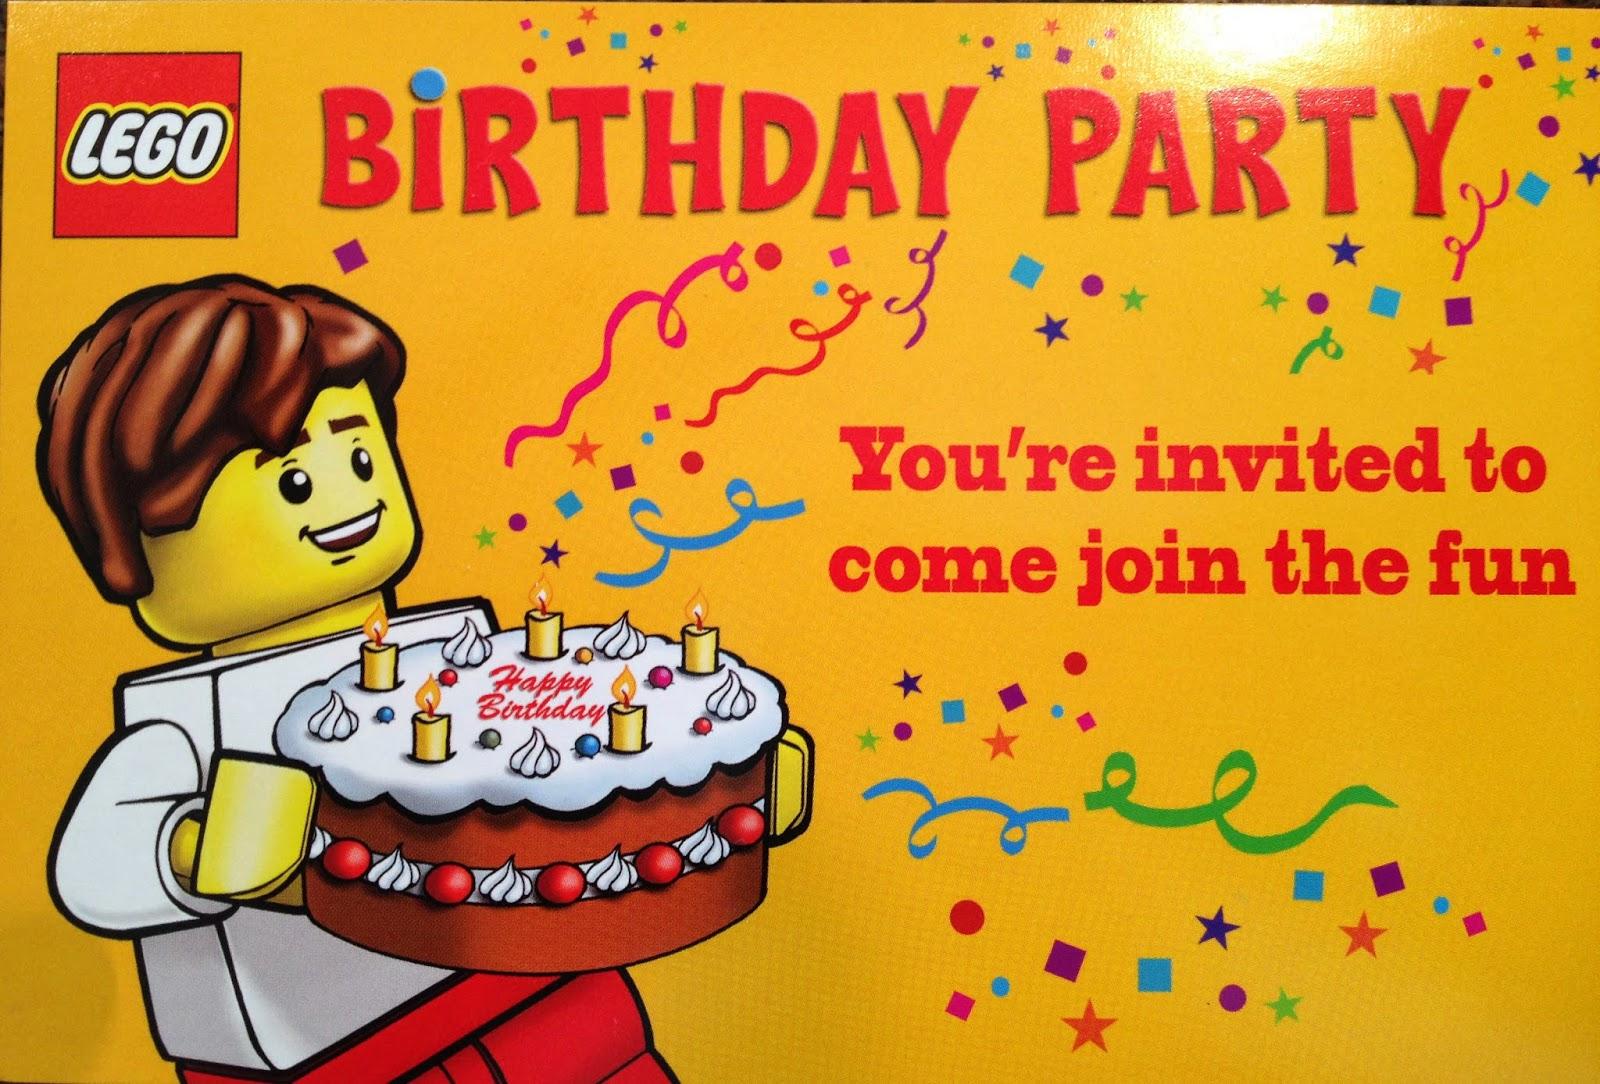 Lego Party Invitations Lego Party Invitations A Beauty Party - Lego Party Invitations Printable Free